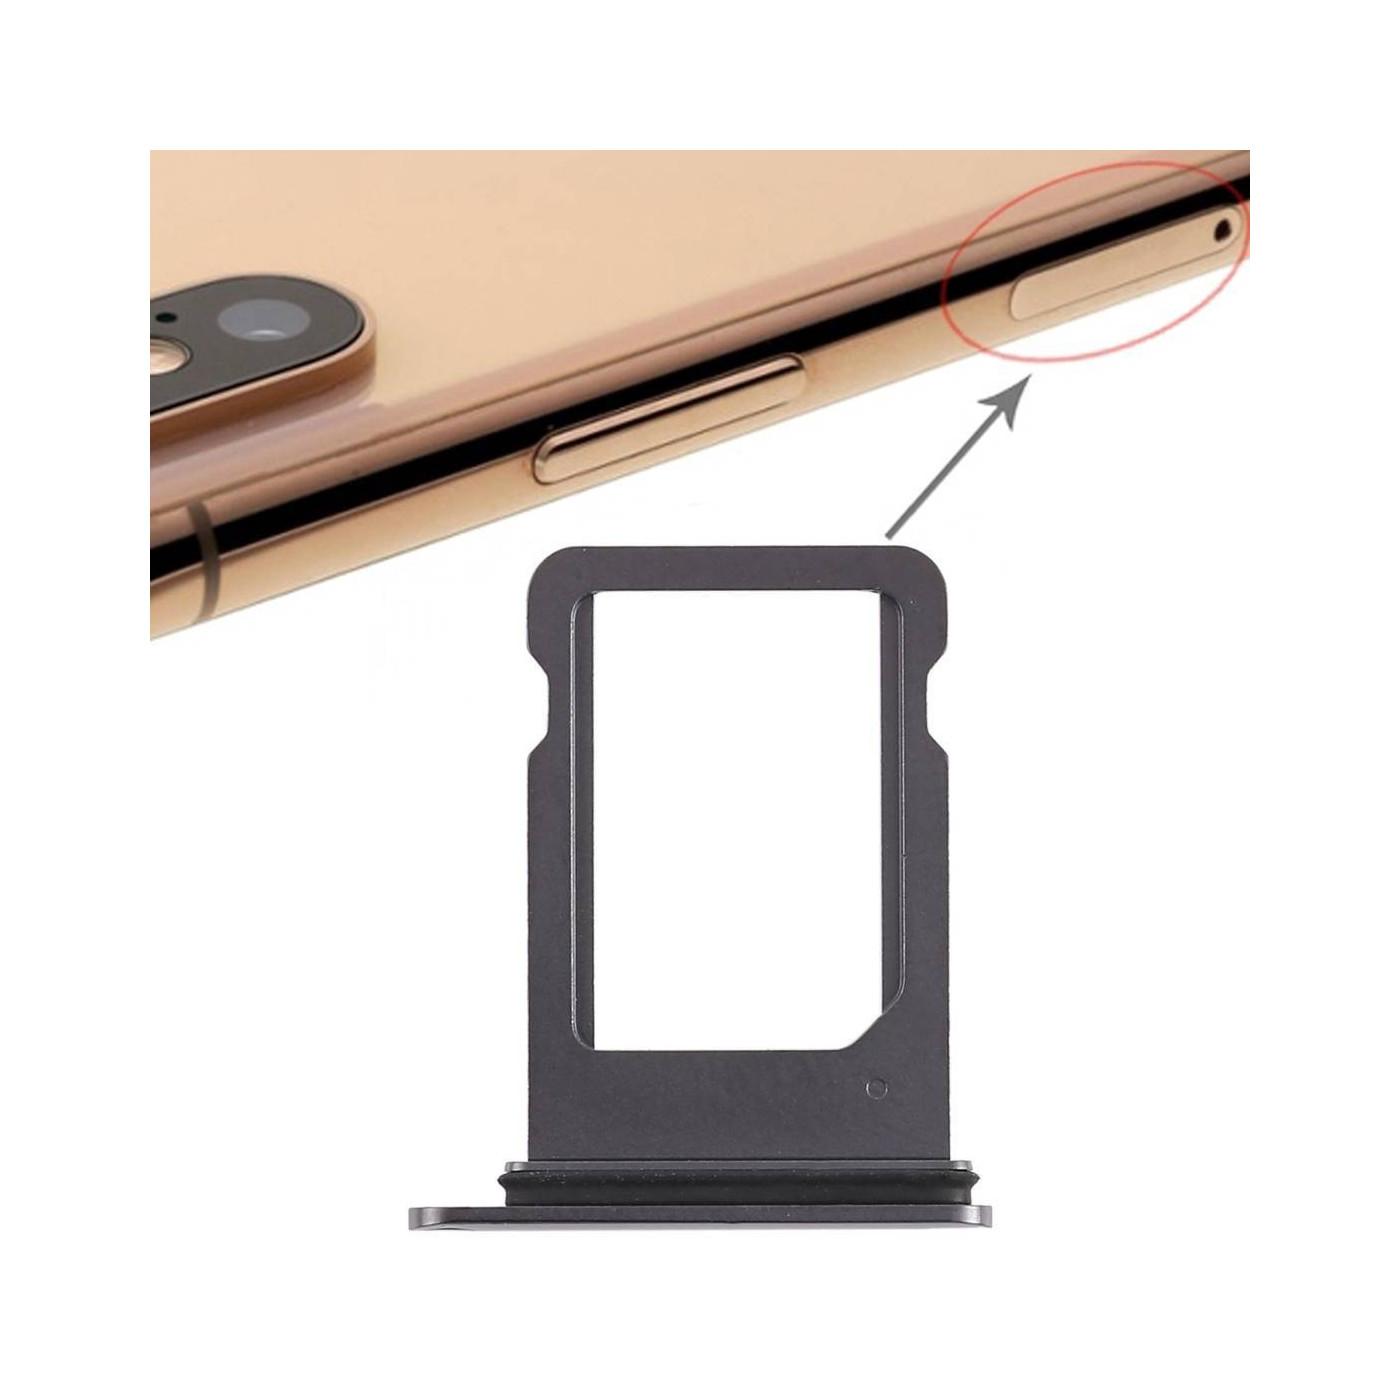 PUERTO Apple iPhone SIM CARD SLOT XS ZAPATO NEGRO CARRO bandeja de reemplazo